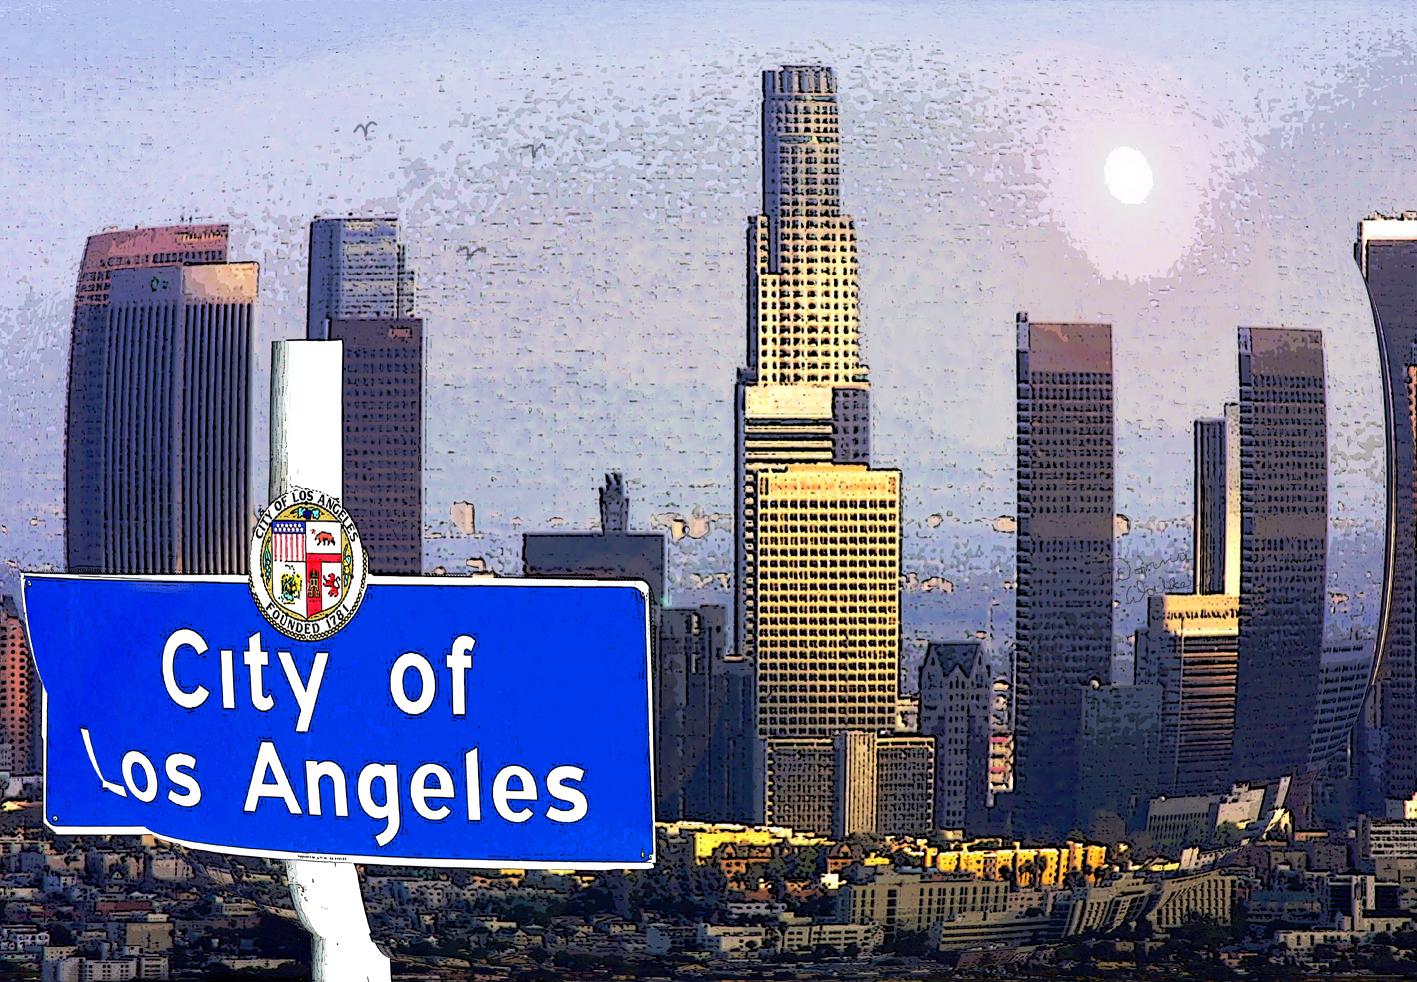 Distinctive Los Ca City Angels Hearts Los Angeles Pest Control Service Certified Organic Skyline Pest Control Mcdonough Skyline Pest Control Pay houzz-03 Skyline Pest Control